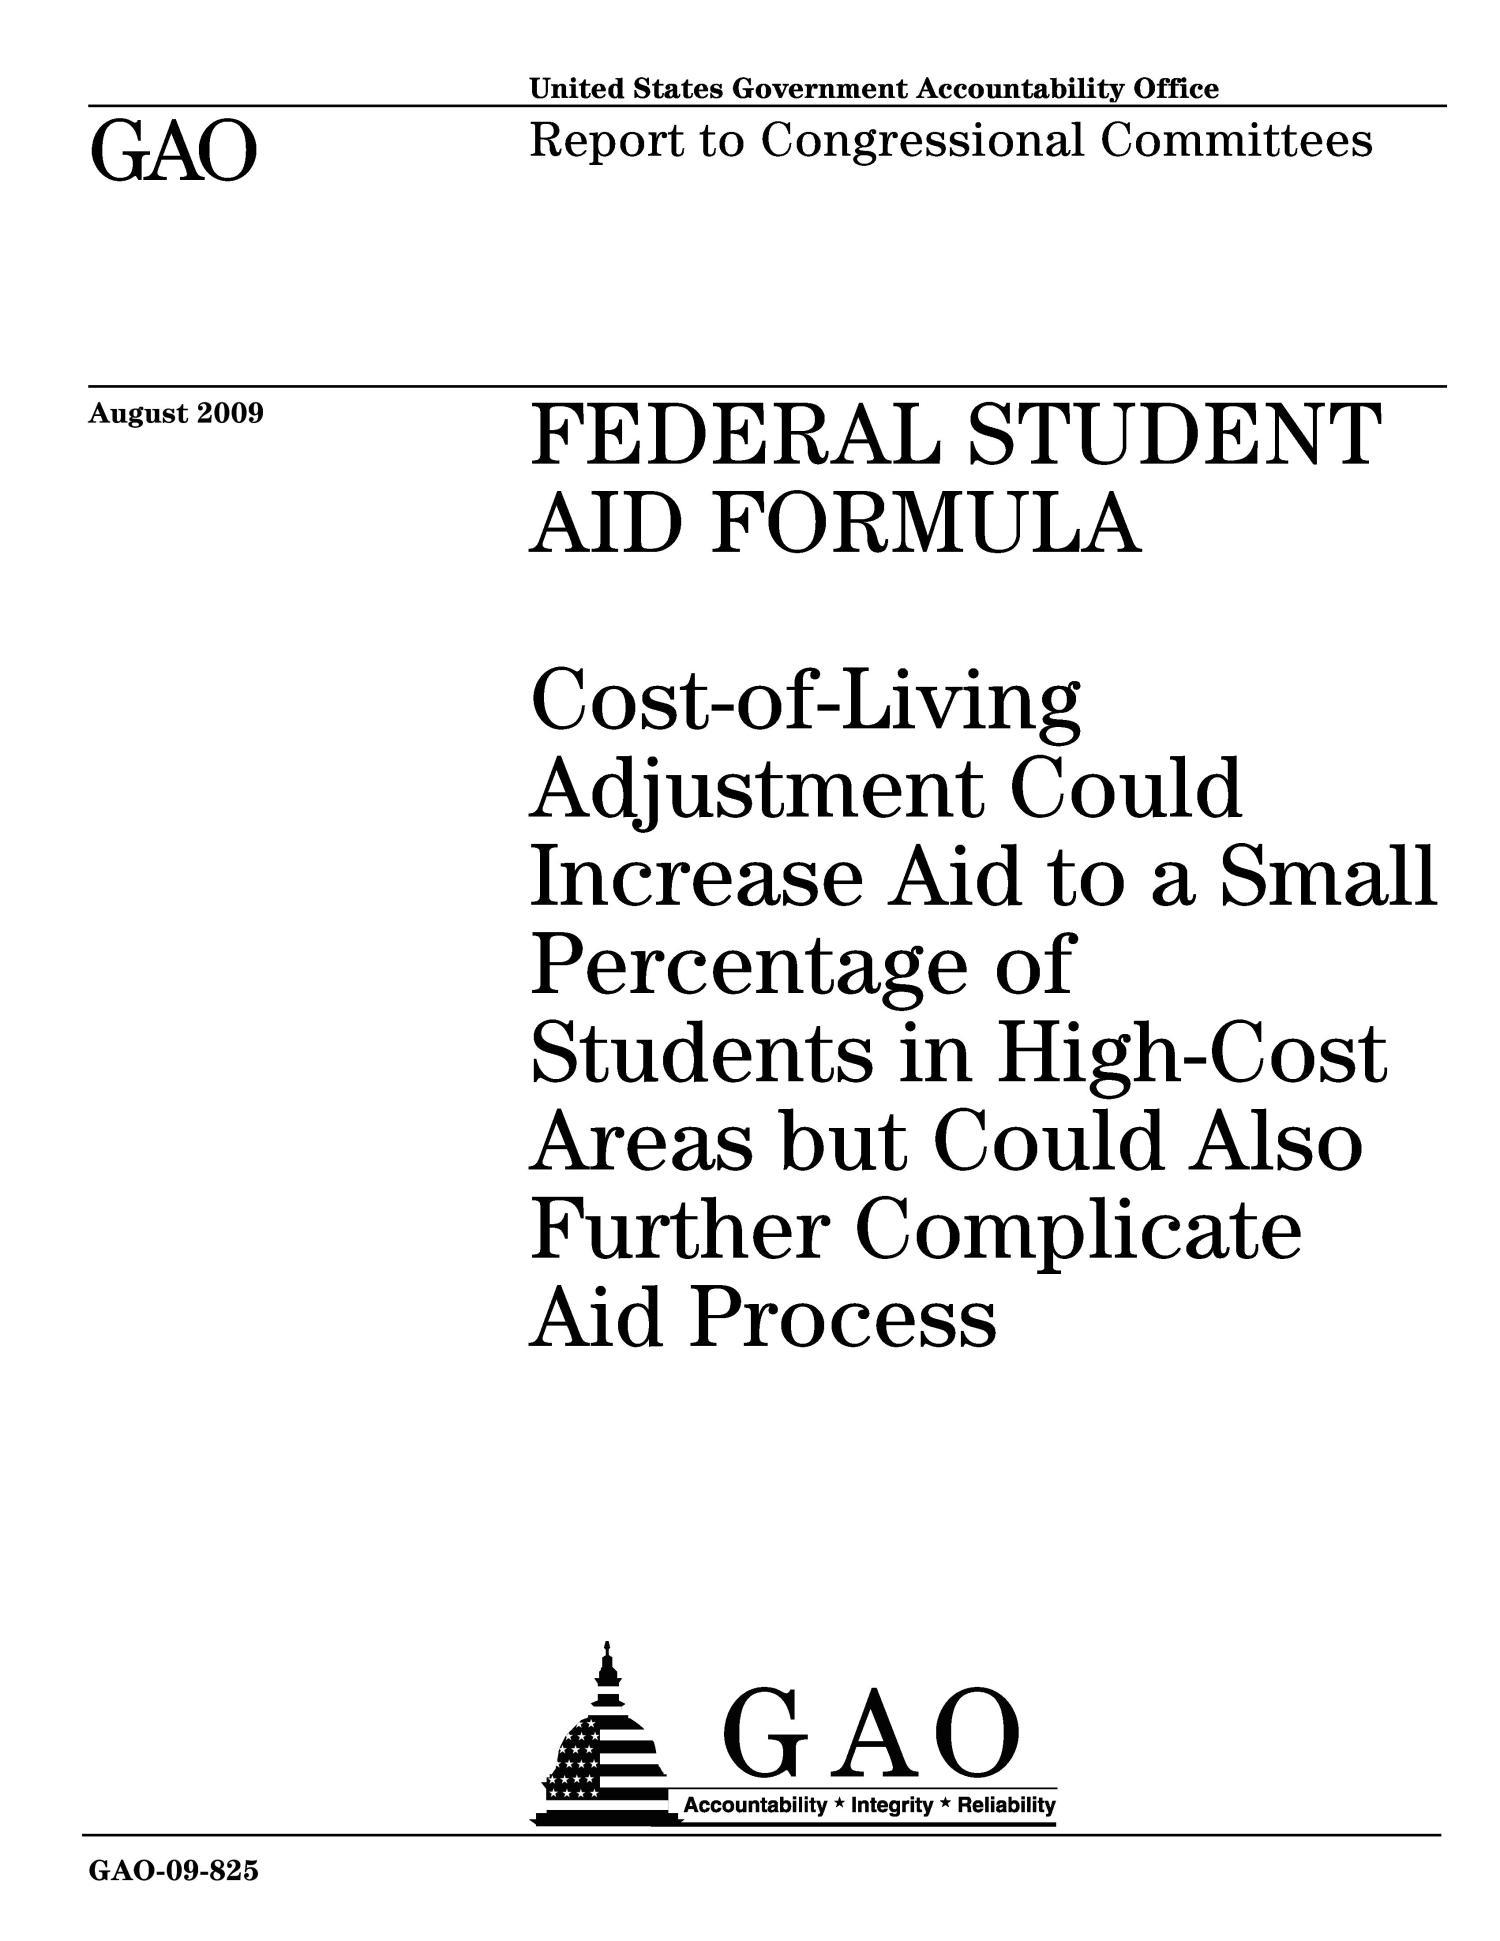 Federal Student Aid Formula Cost Of Living Adjustment